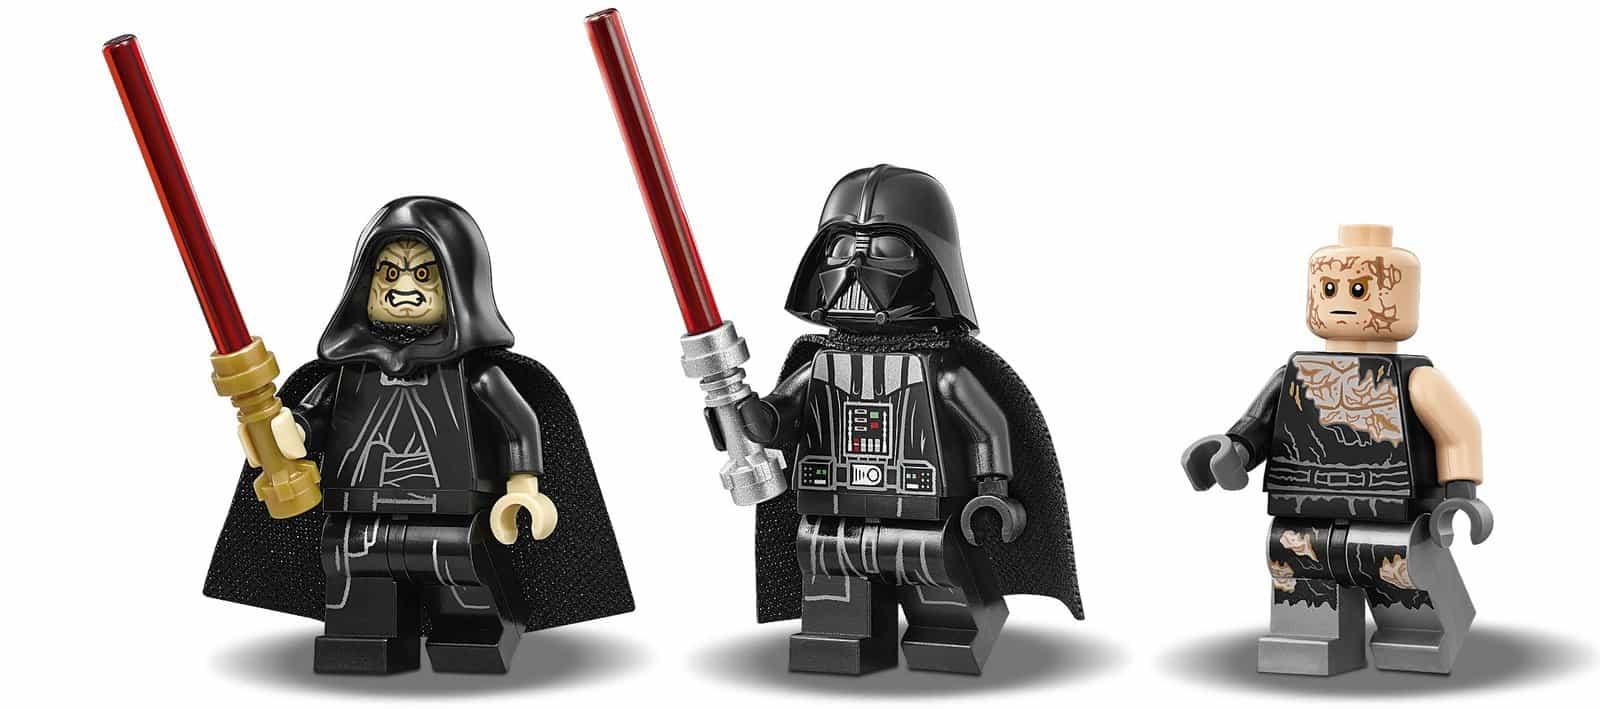 FX-6 Medical Droid, Darth Vader, Anakin, Palpatine ...